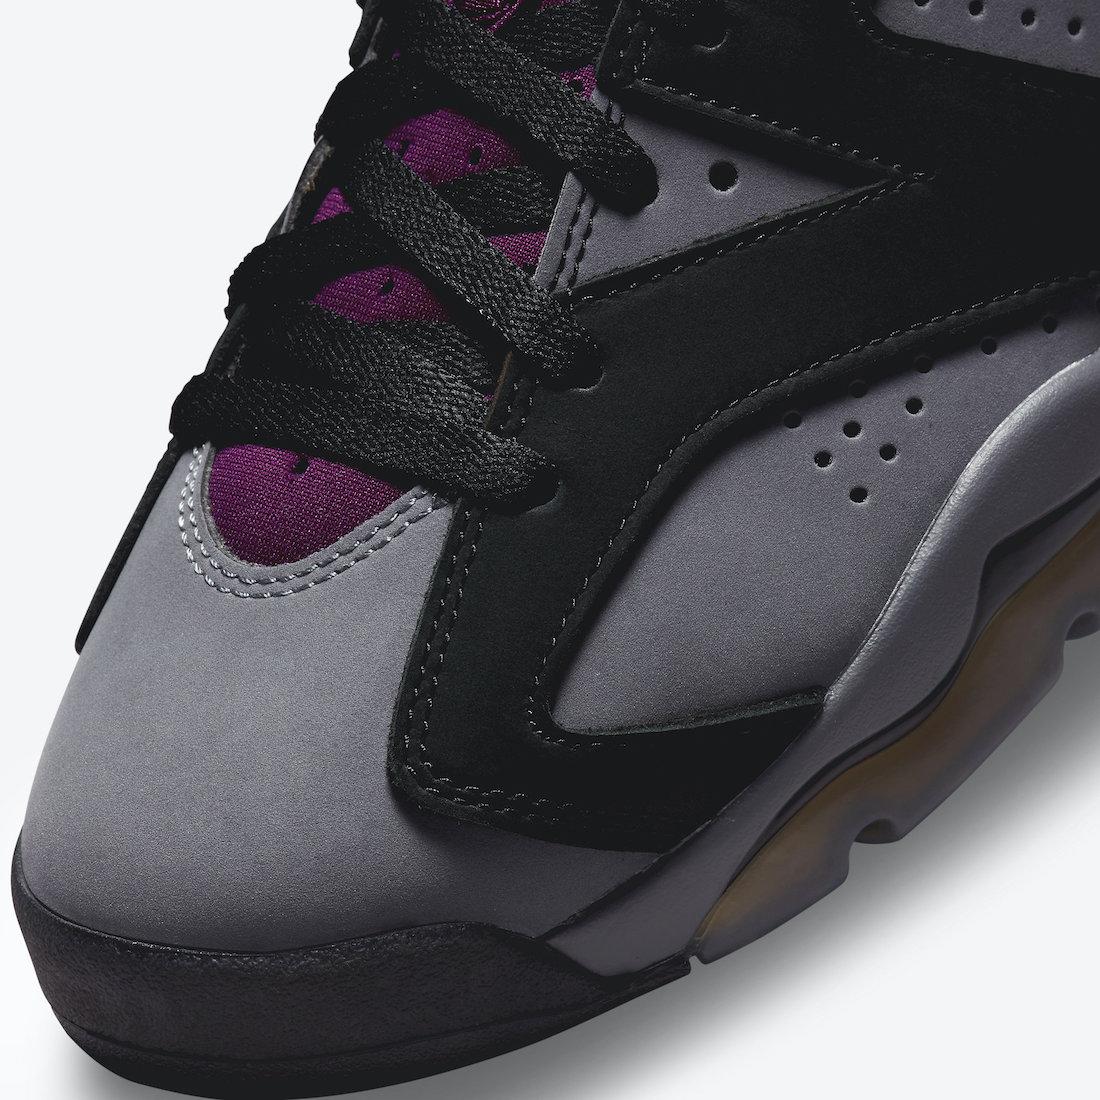 Air-Jordan-6-Bordeaux-CT8529-063-Release-Date-6